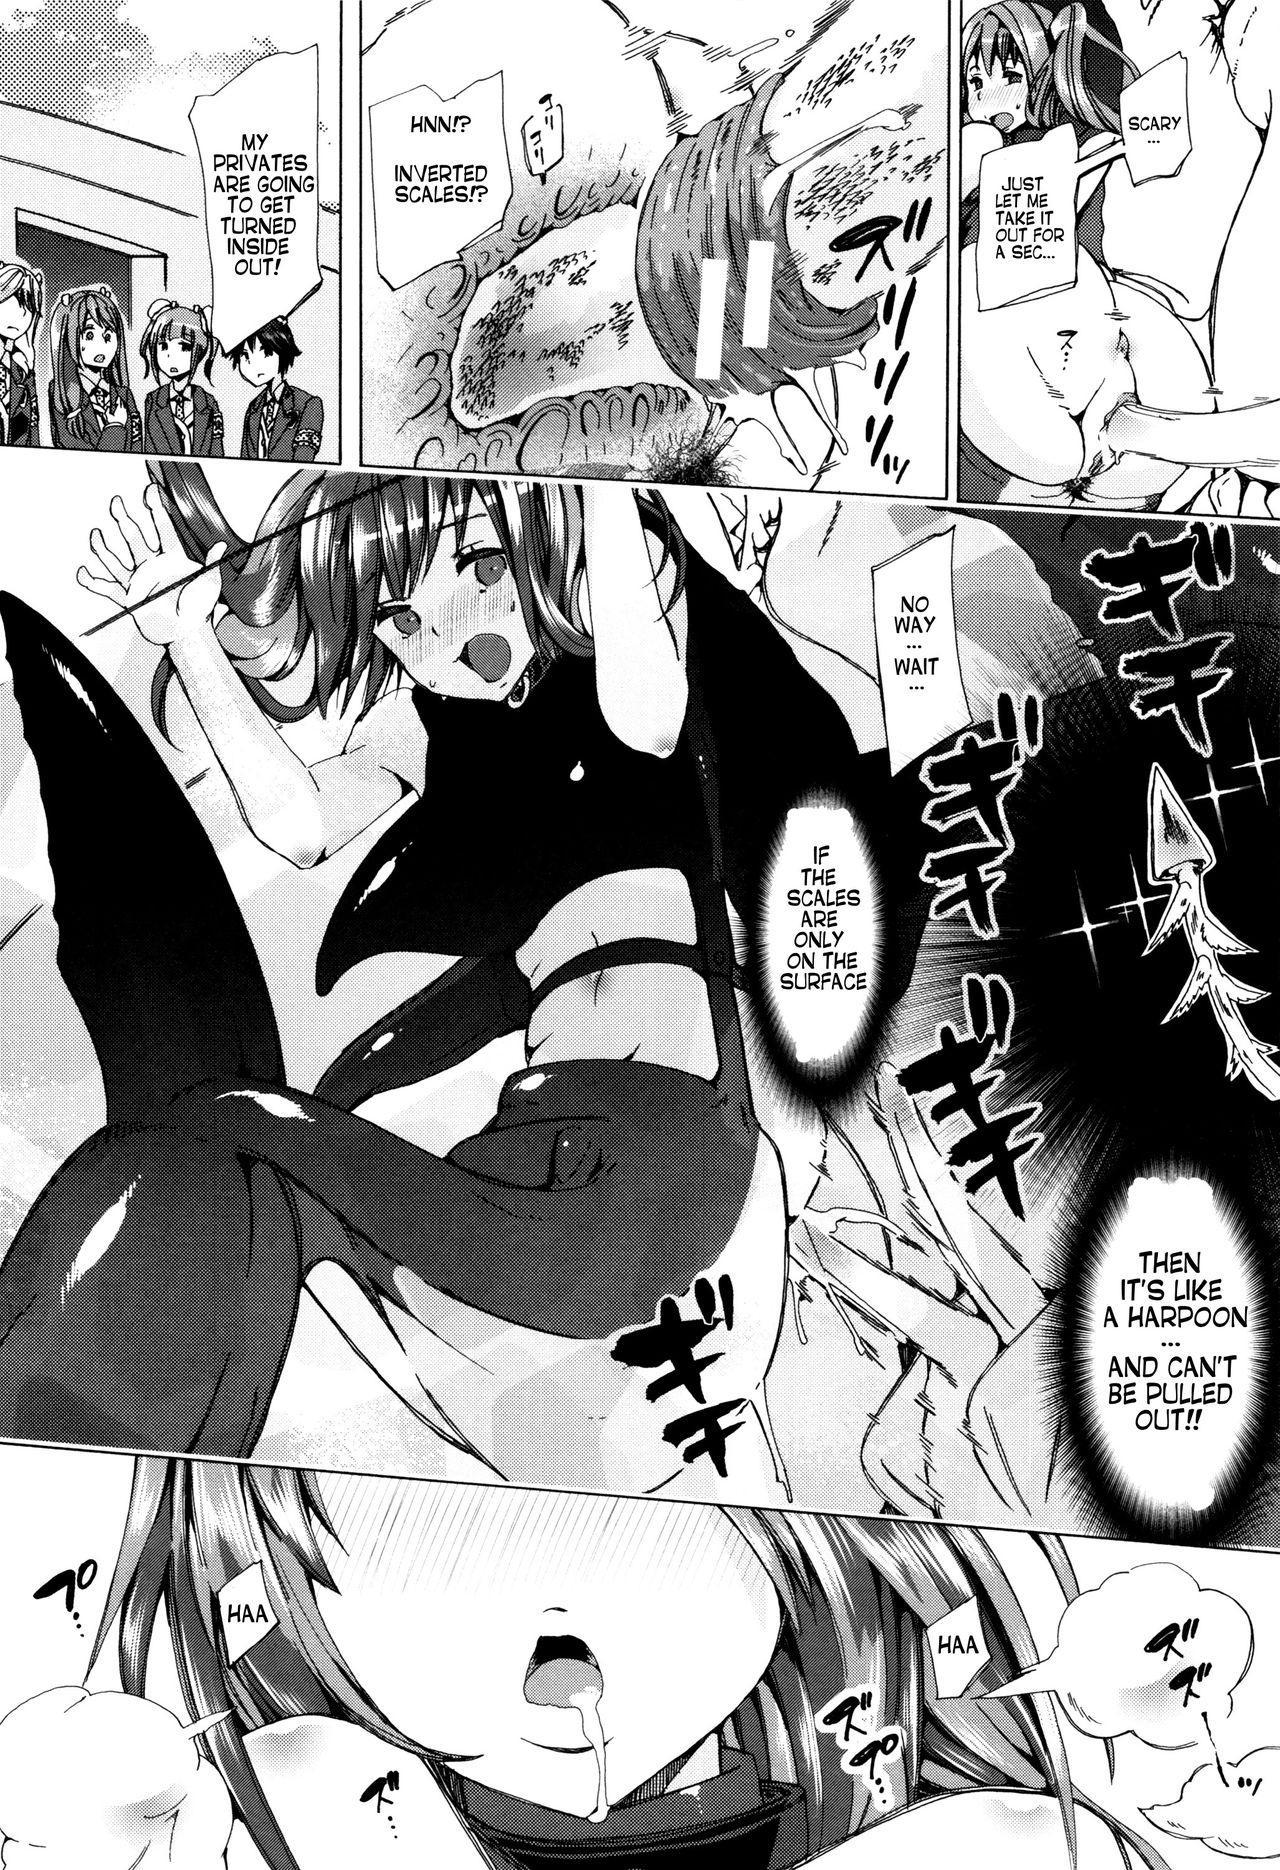 [Chikiko] Juukan Kyoushitsu - Bestiality Classroom Ch. 1-5 [English] [Neeko7] 94